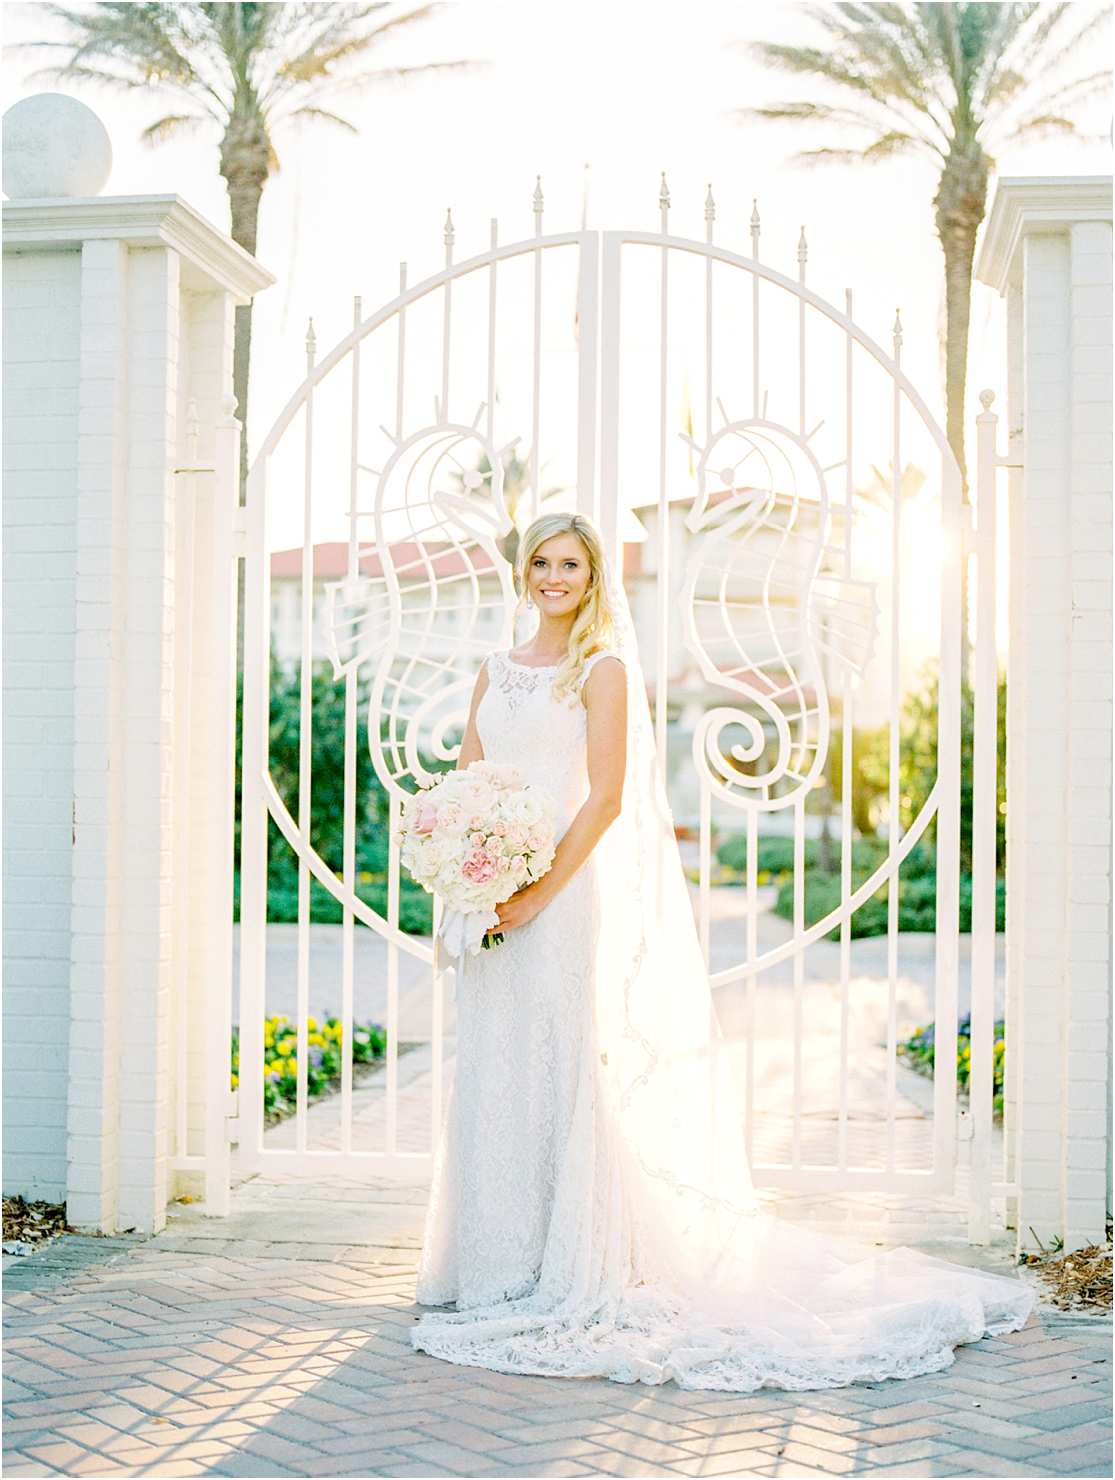 Lisa Silva Photography- Ponte Vedra Beach and Jacksonville, Florida Fine Art Film Wedding Photography- Wedding at the Ponte Vedra Inn and Club_0019.jpg